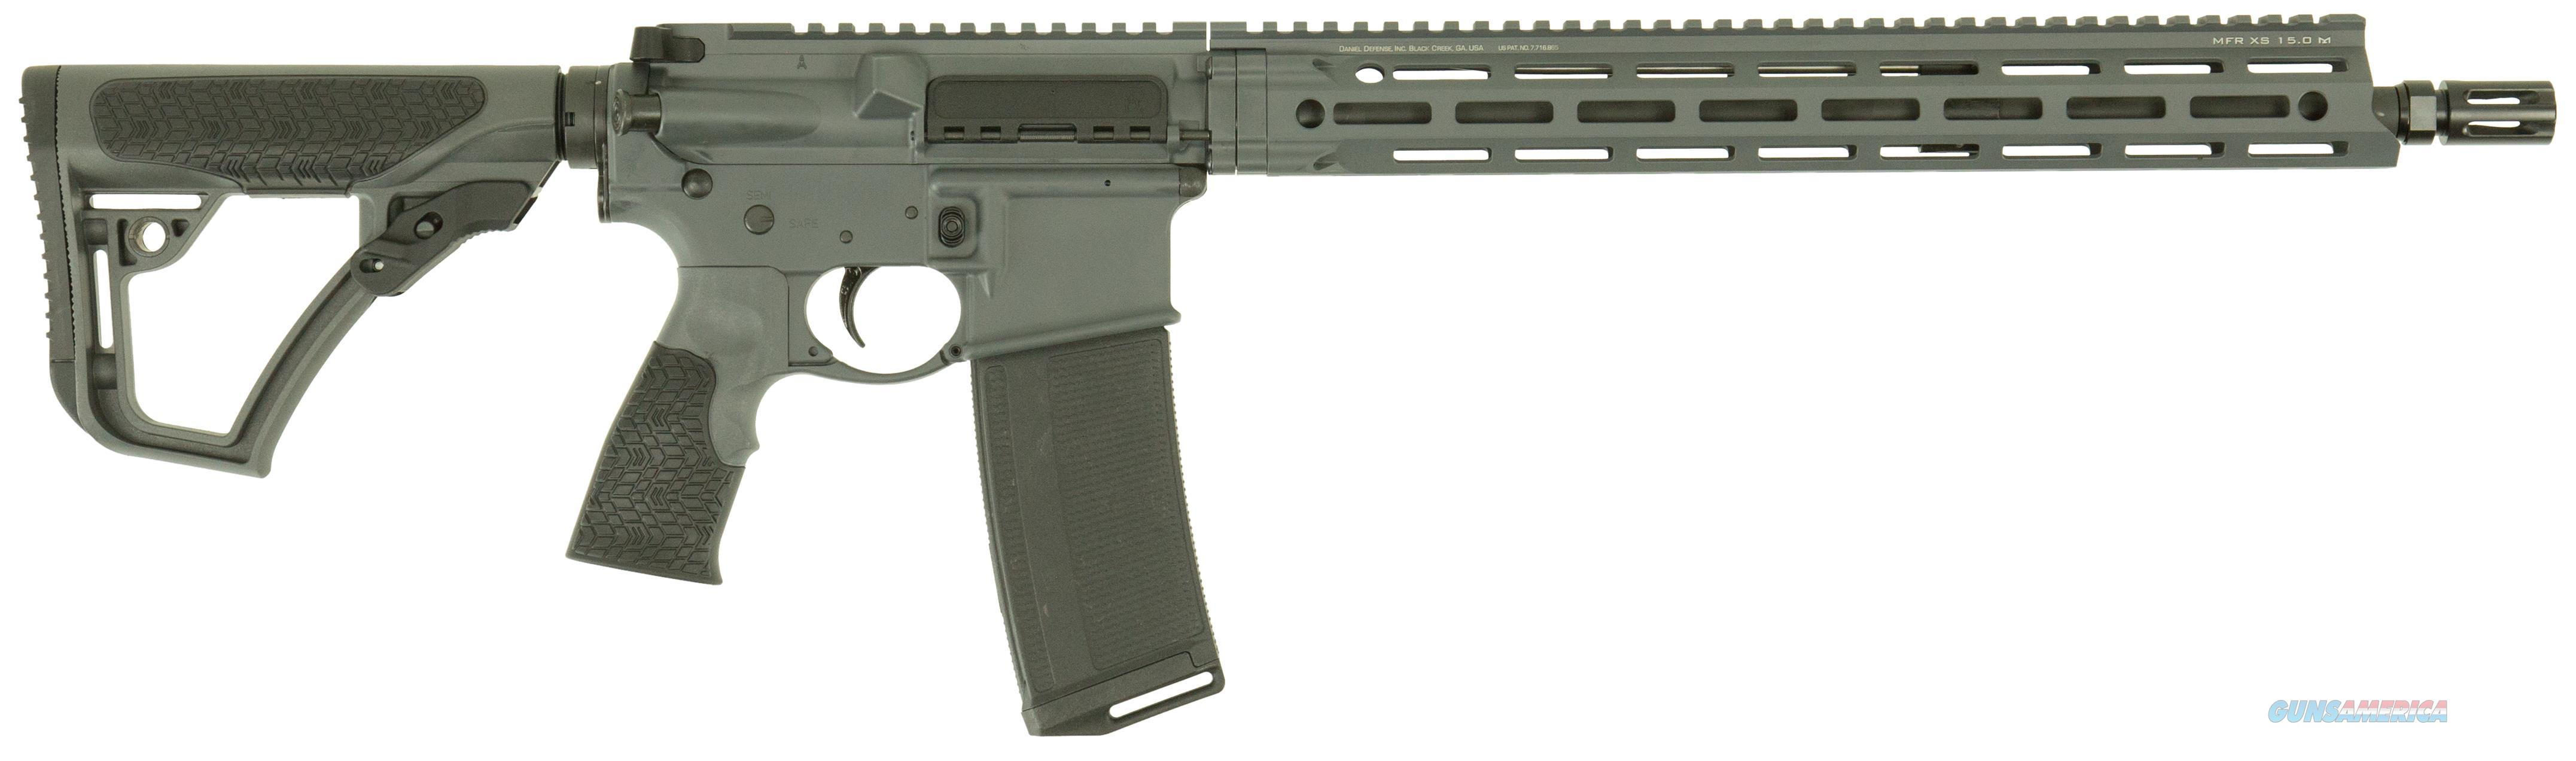 Daniel Defense Ddm4v7 Tornado 5.56 Nato 16Bbl Grey Mag 13042047  Guns > Rifles > D Misc Rifles